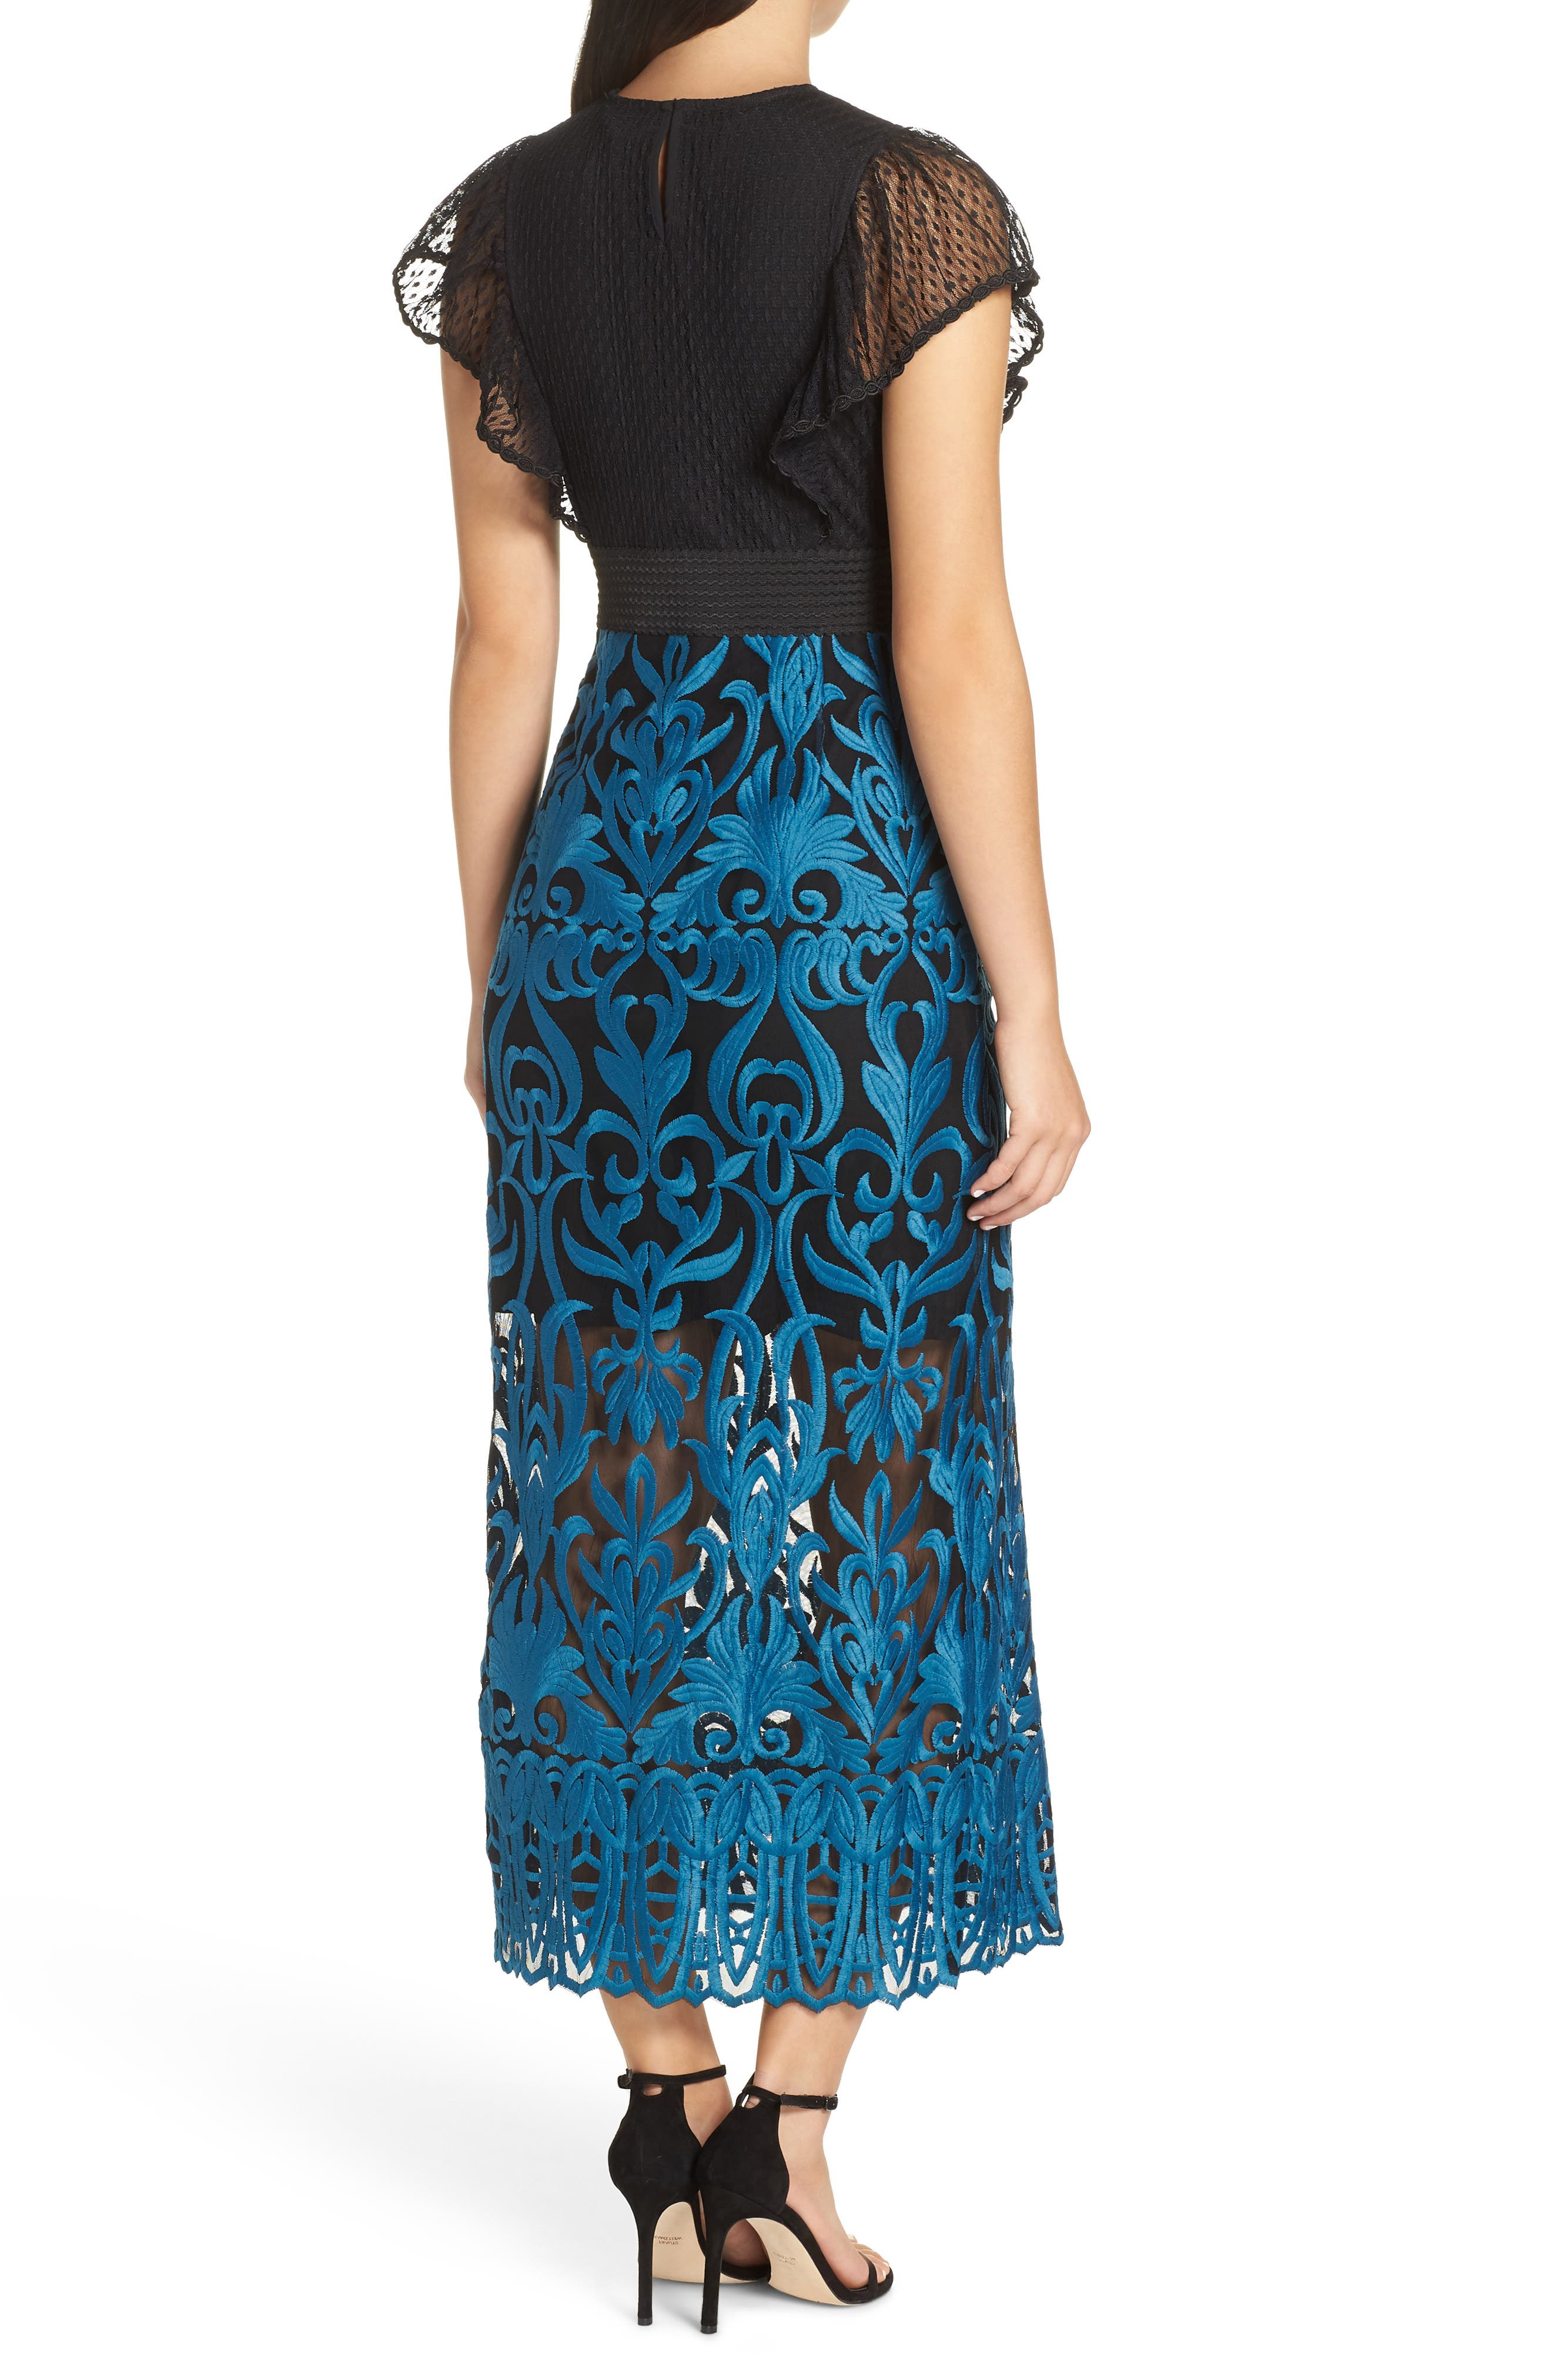 FOXIEDOX, Rosalynn Lace Midi Dress, Alternate thumbnail 2, color, 440